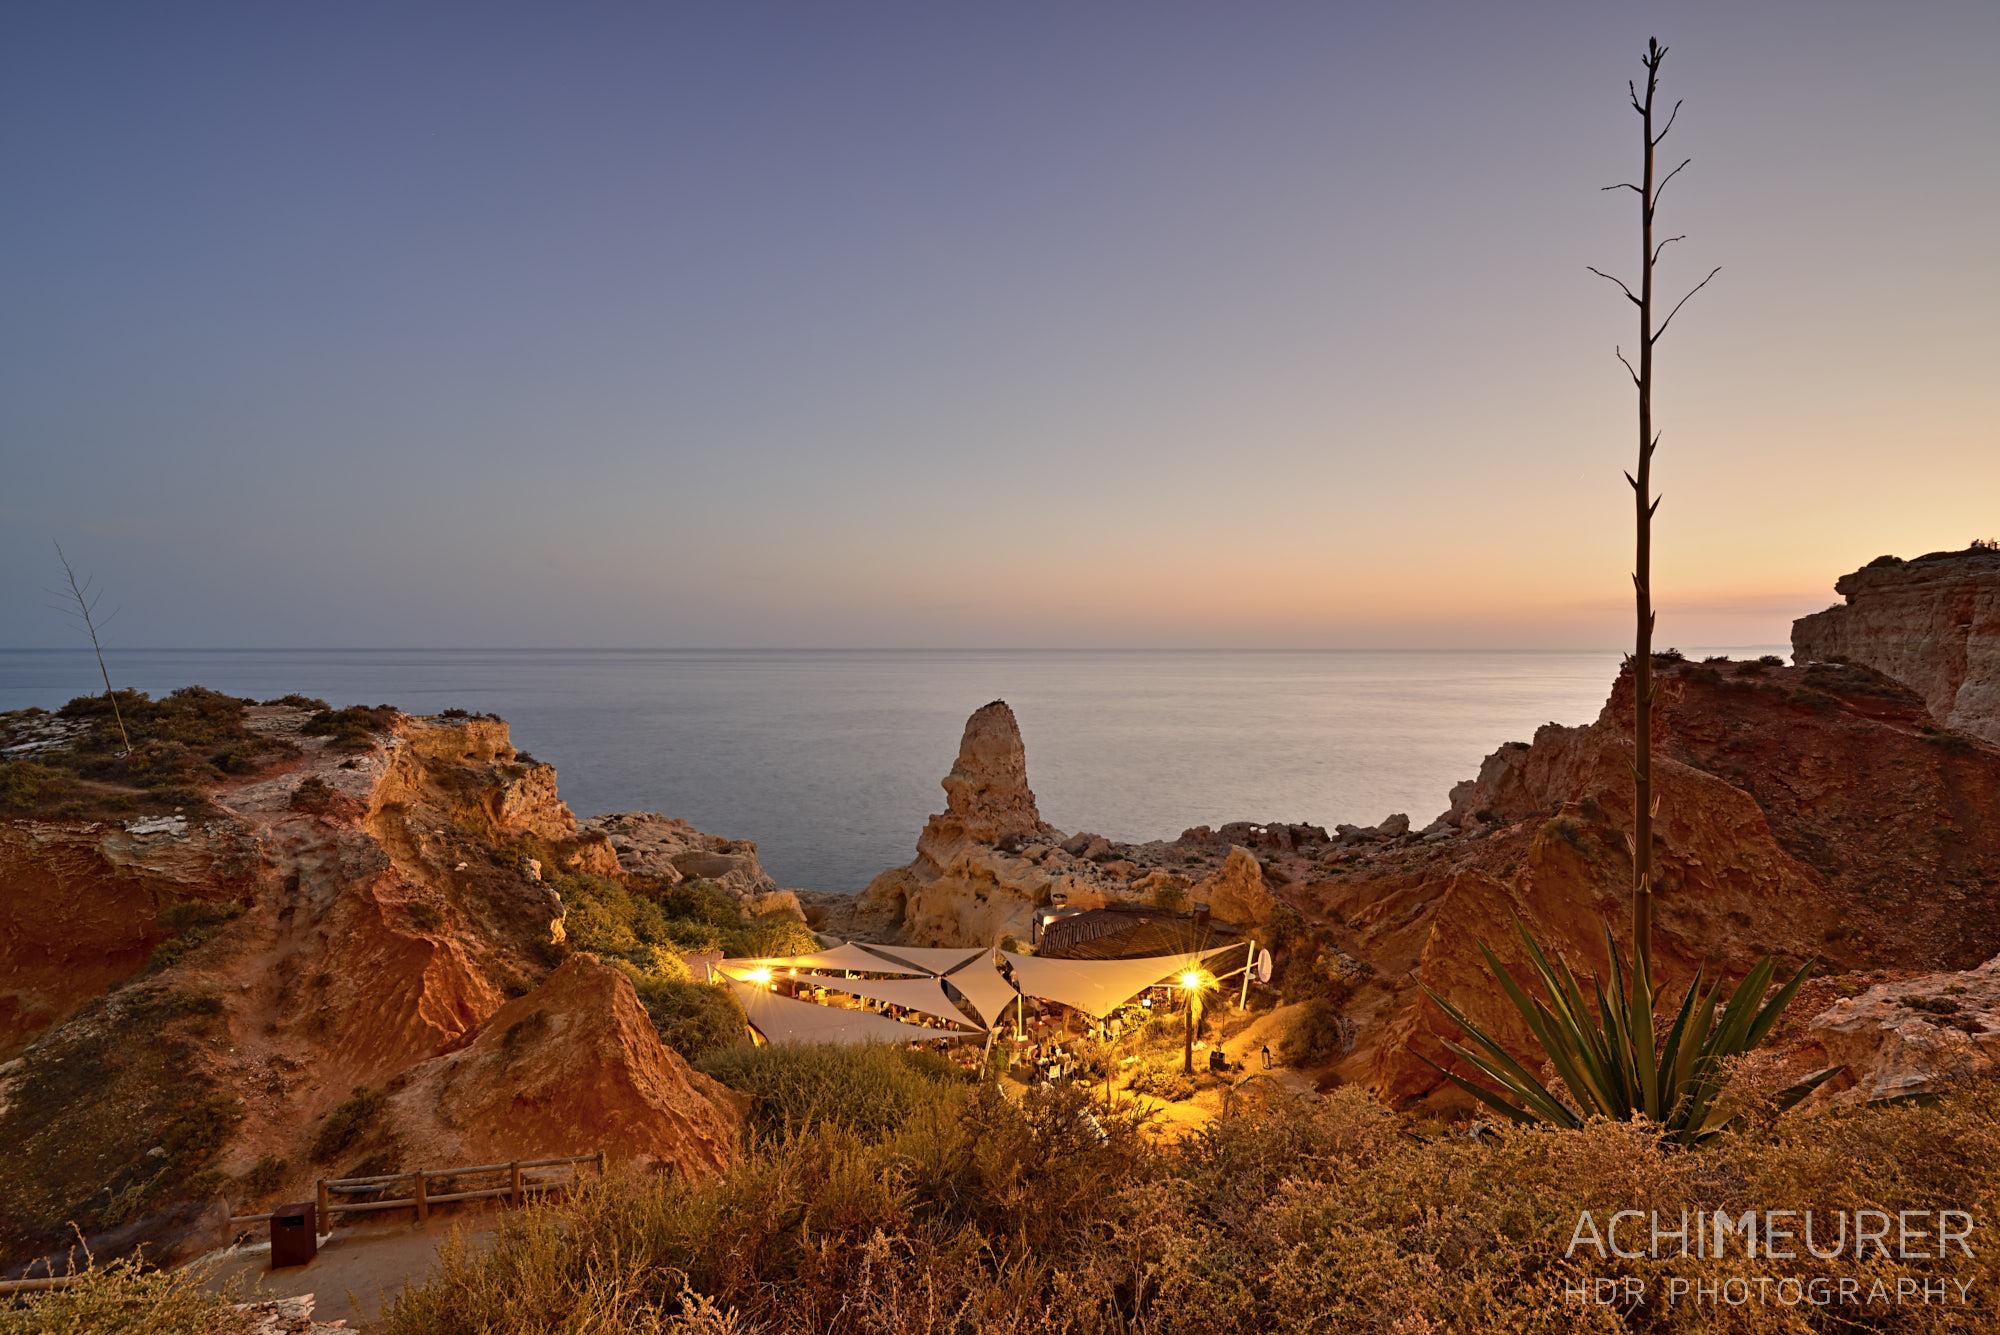 Sonnenuntergang an der Algarve in Portugal